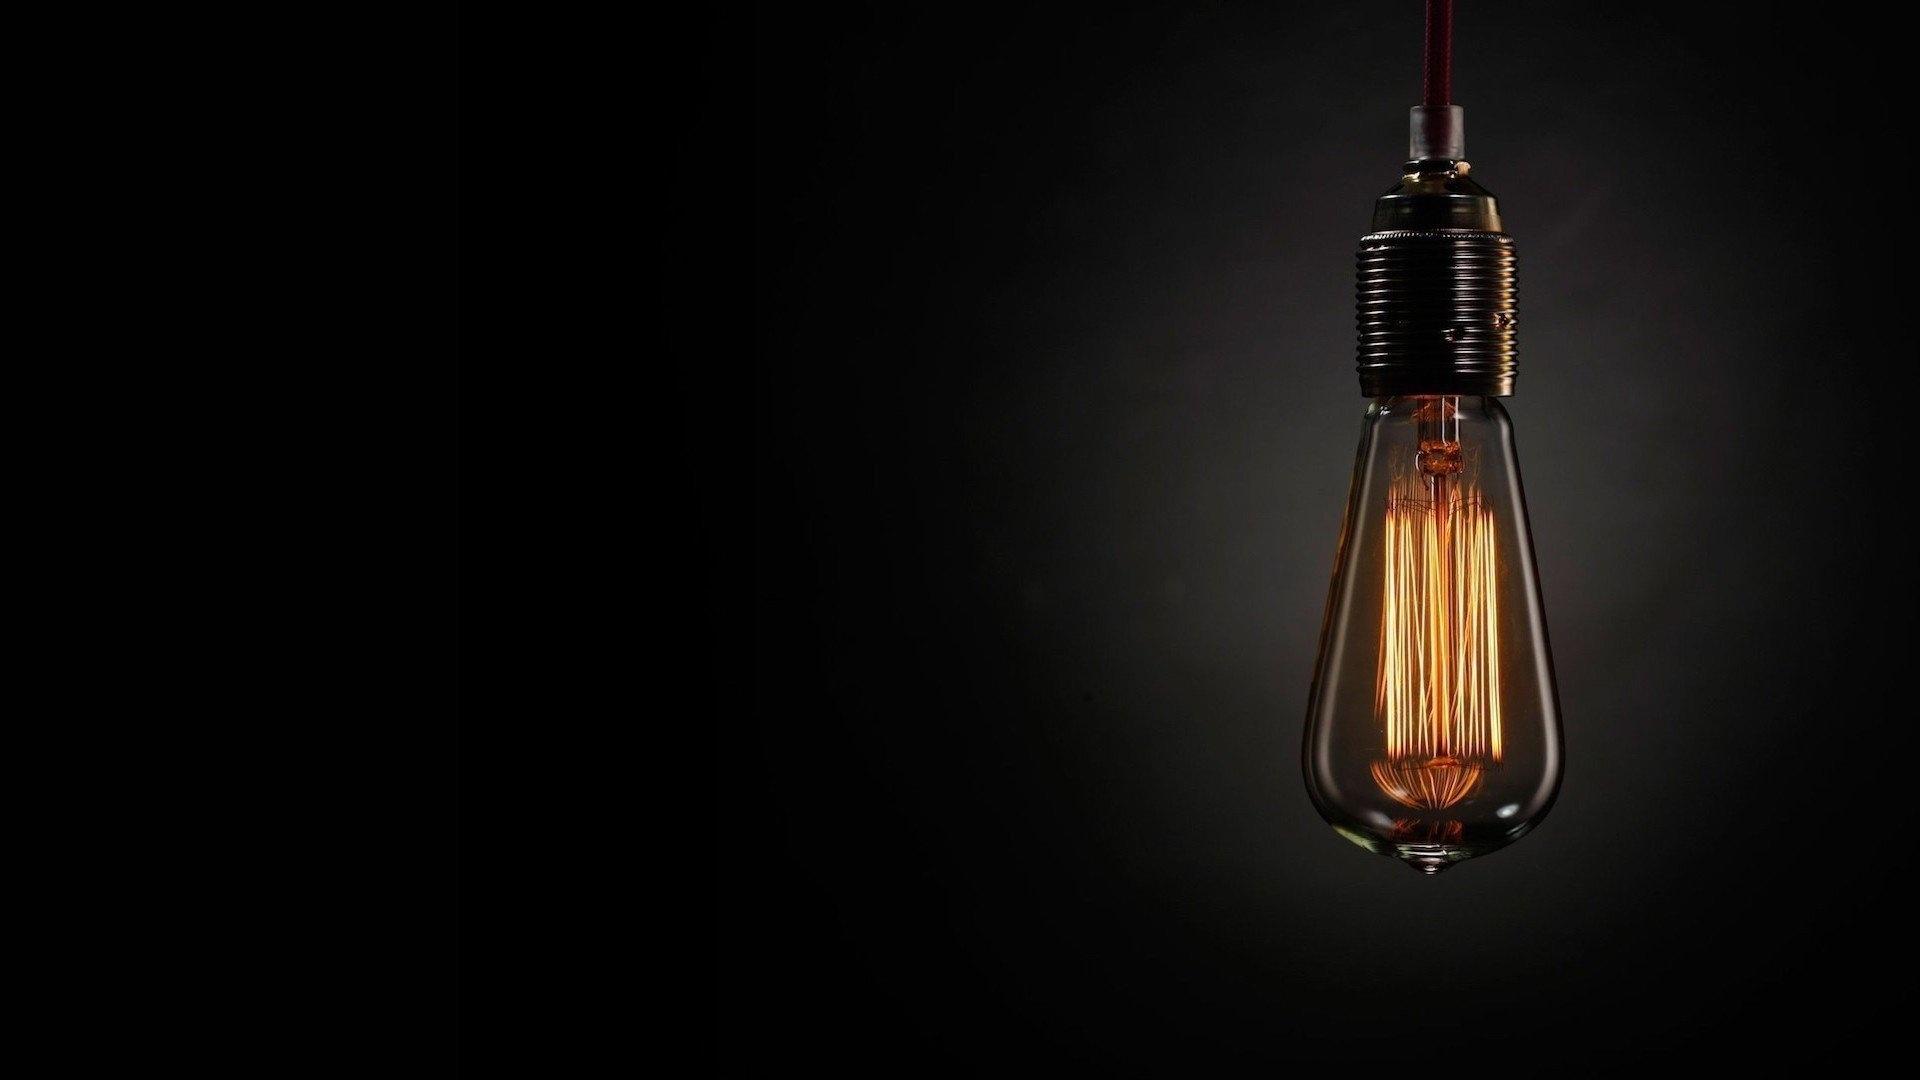 Light Bulb Wallpaper theme